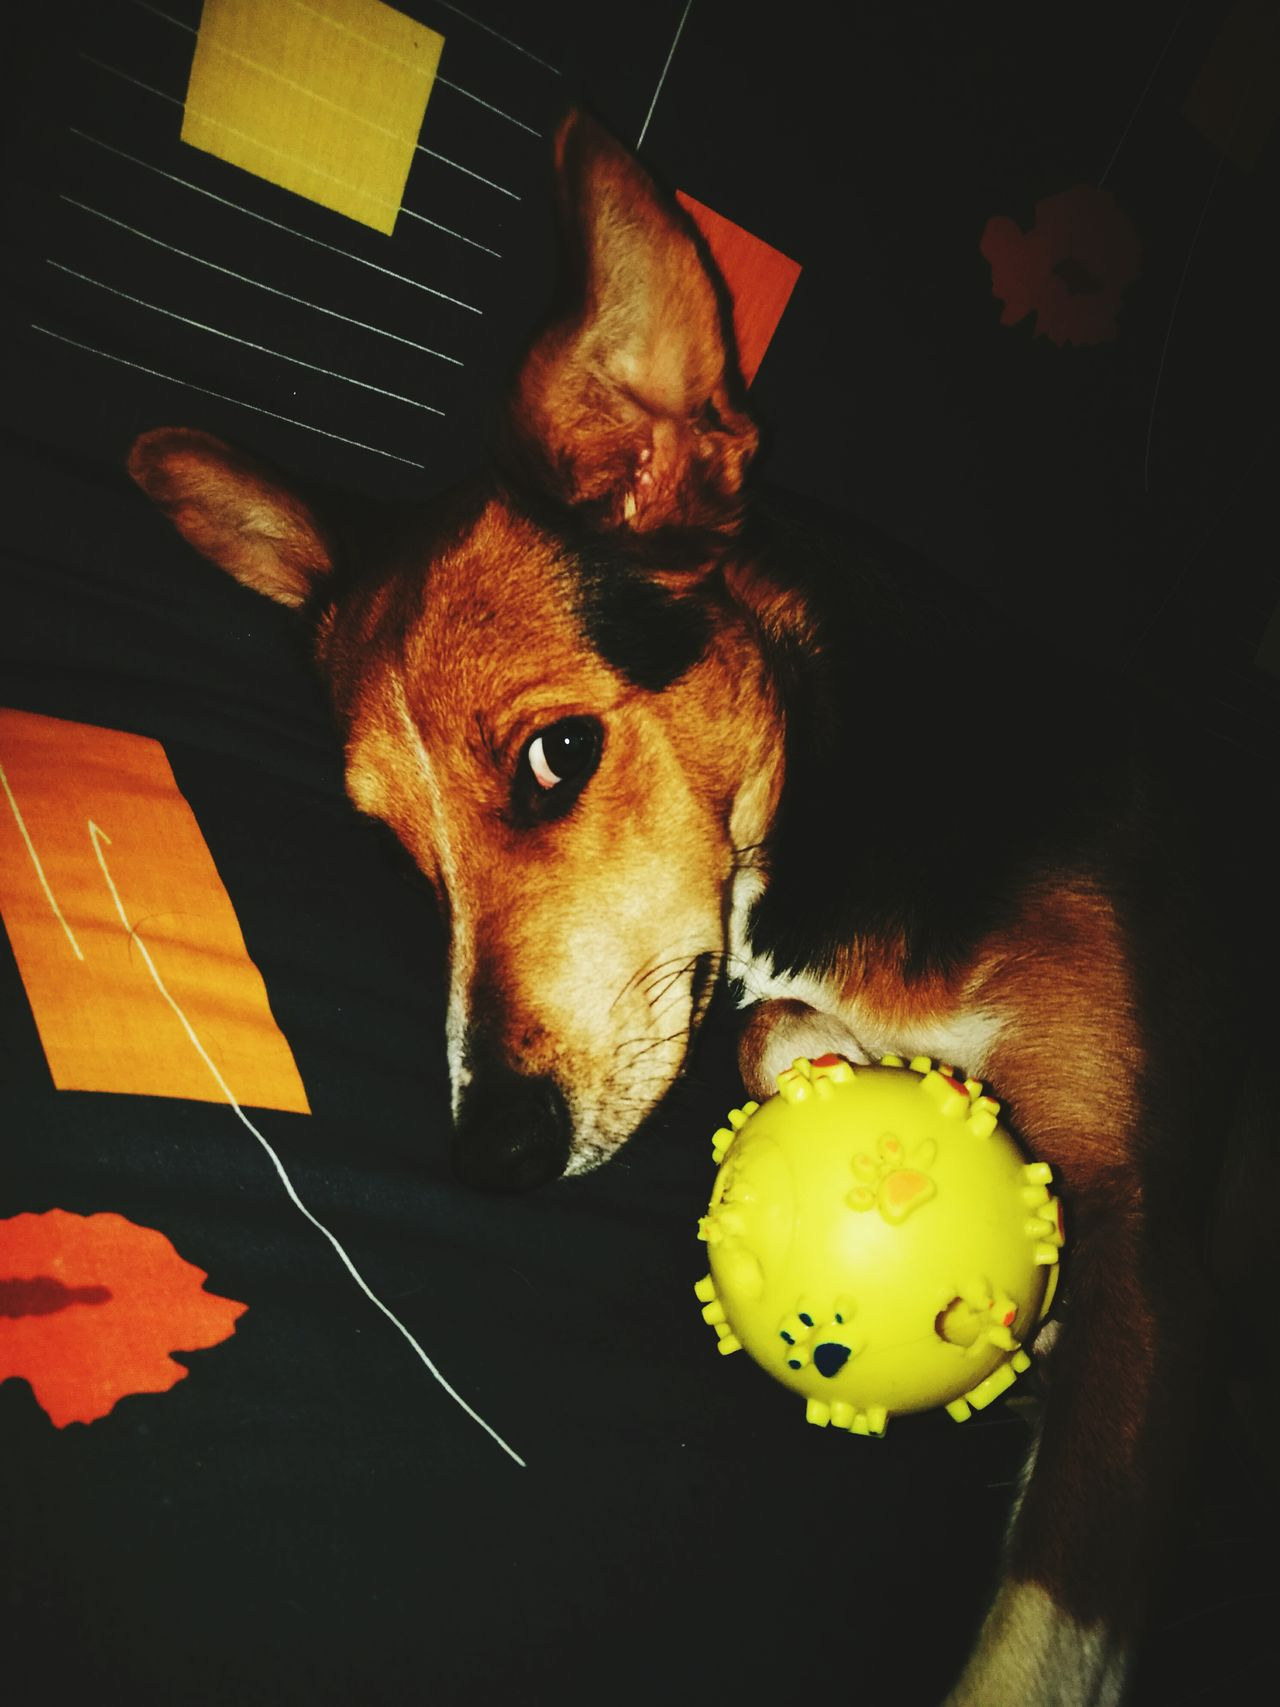 Lasciatemi dormire😂 Pets Domestic Animals Dog Dormirecosì First Eyeem Photo Day